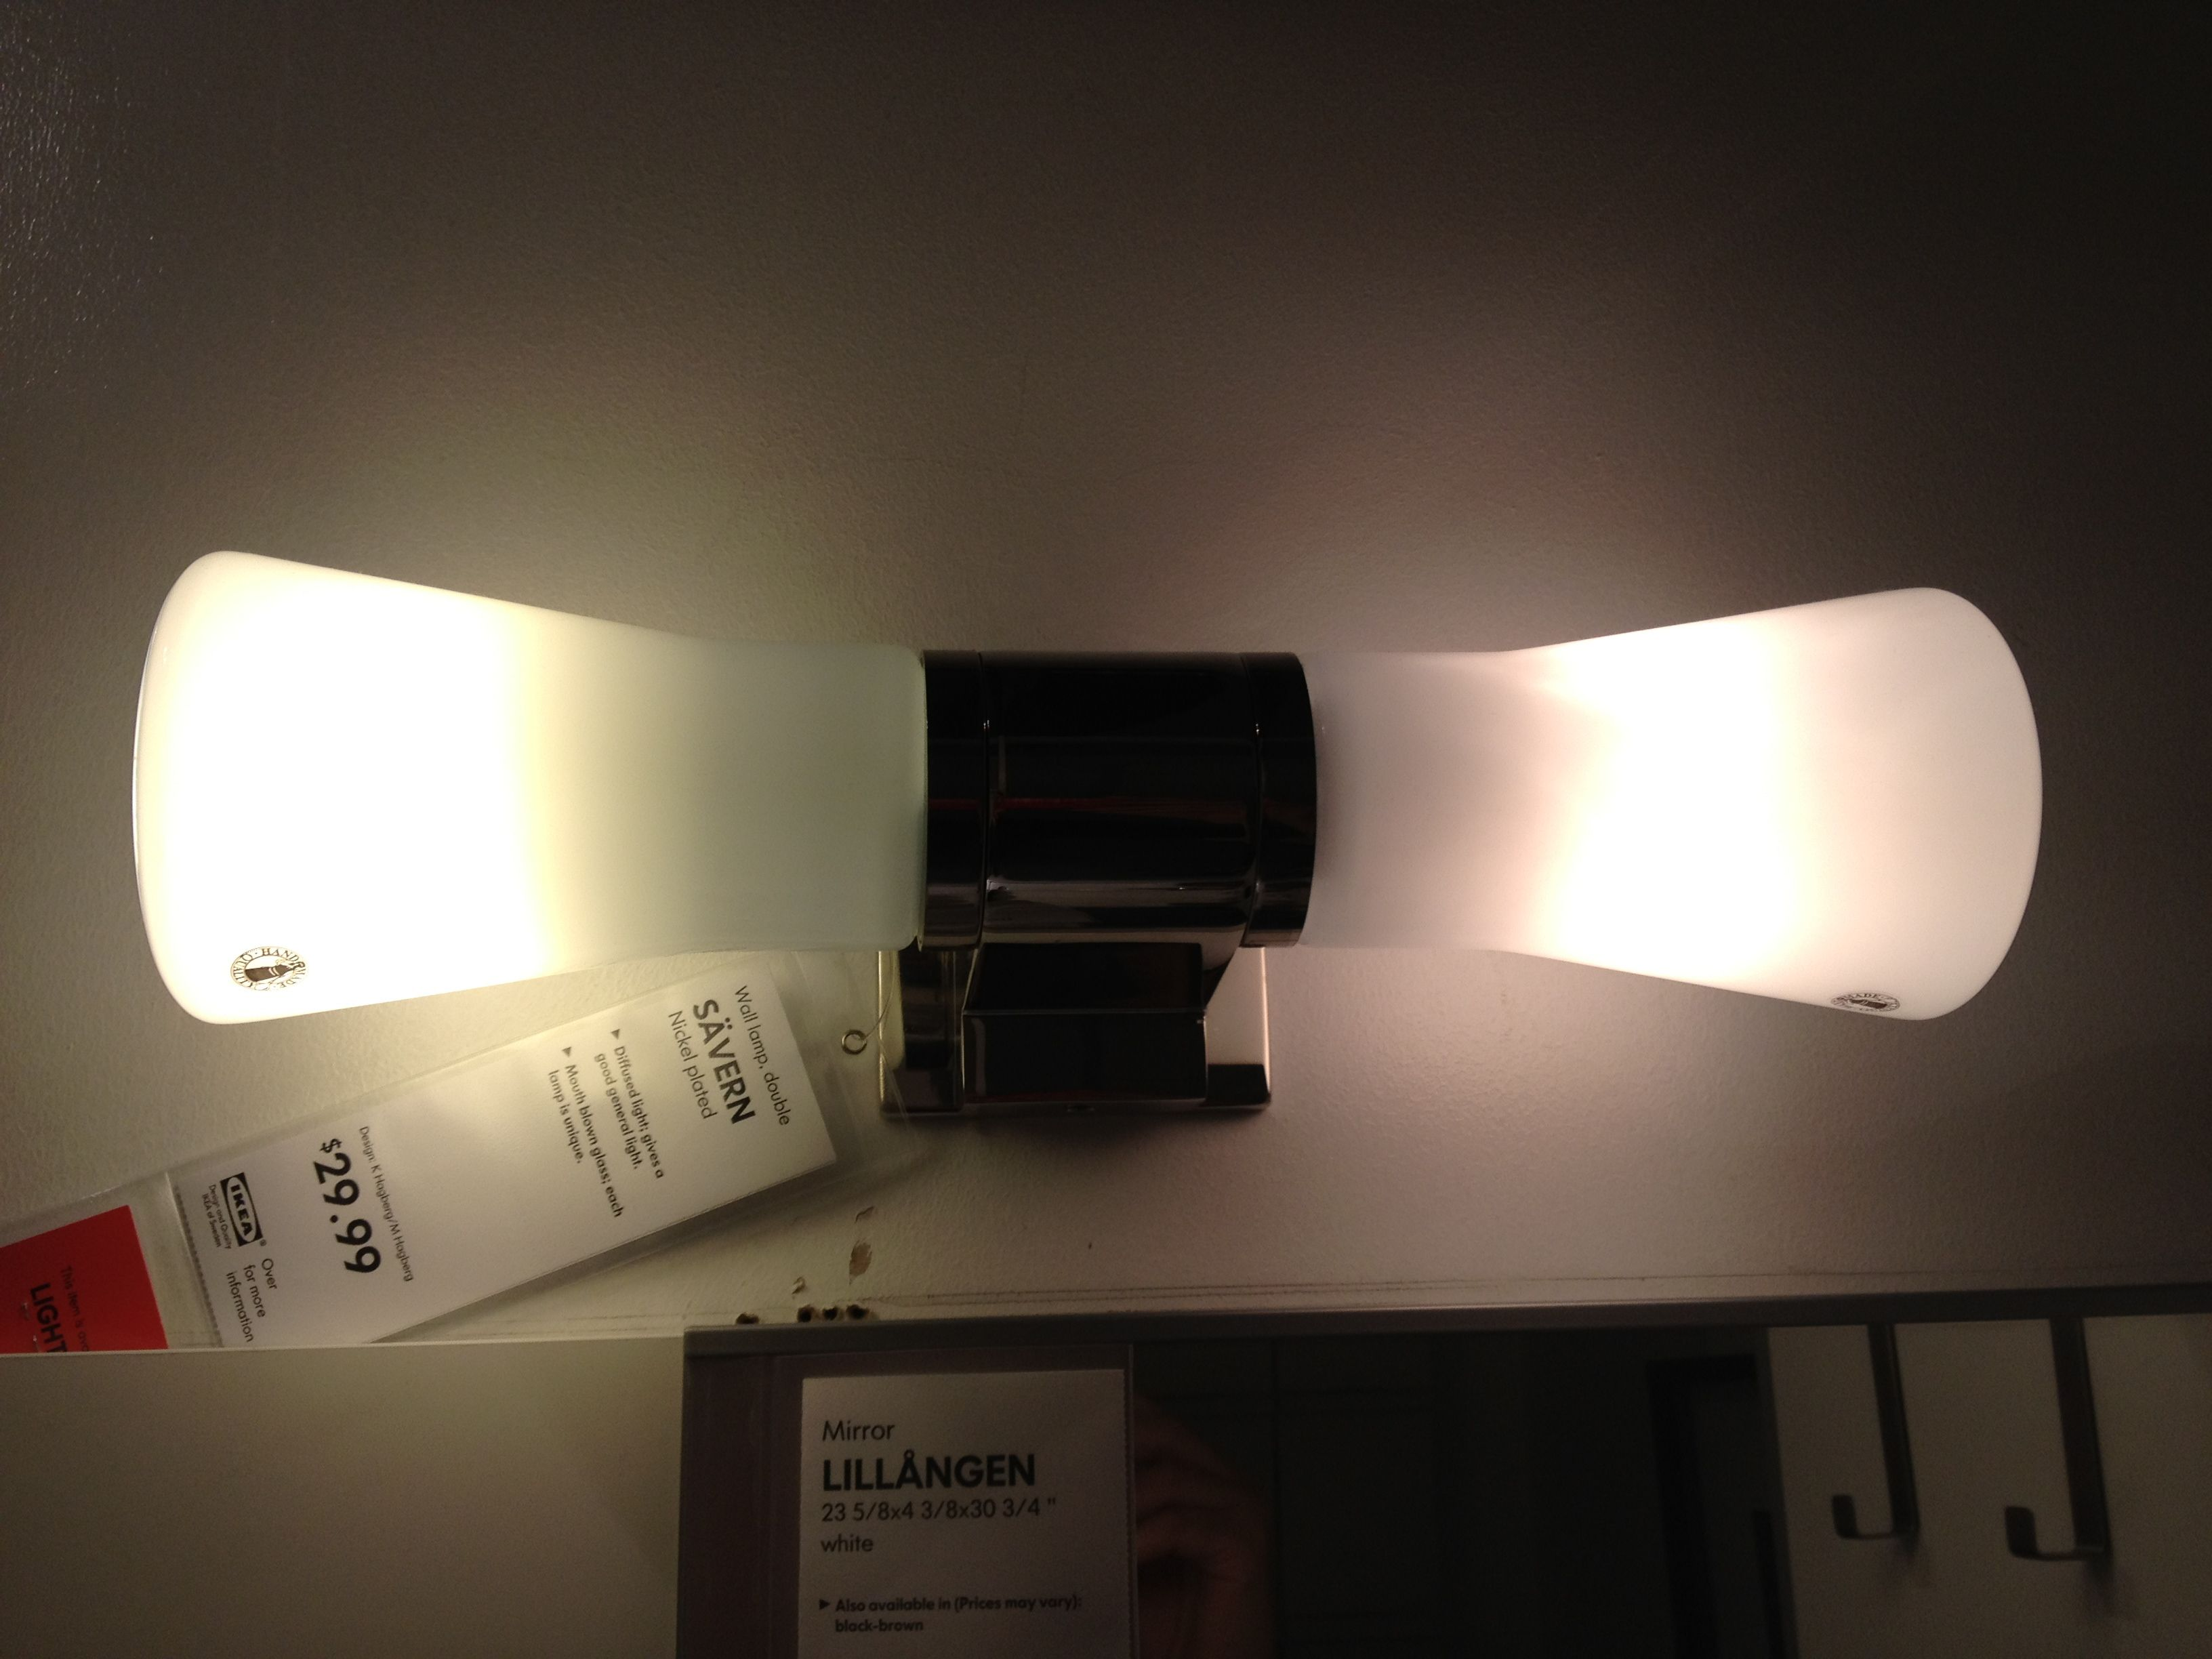 Bathroom Lighting Usa ikea bathroom light | bathrooms | pinterest | ikea bathroom